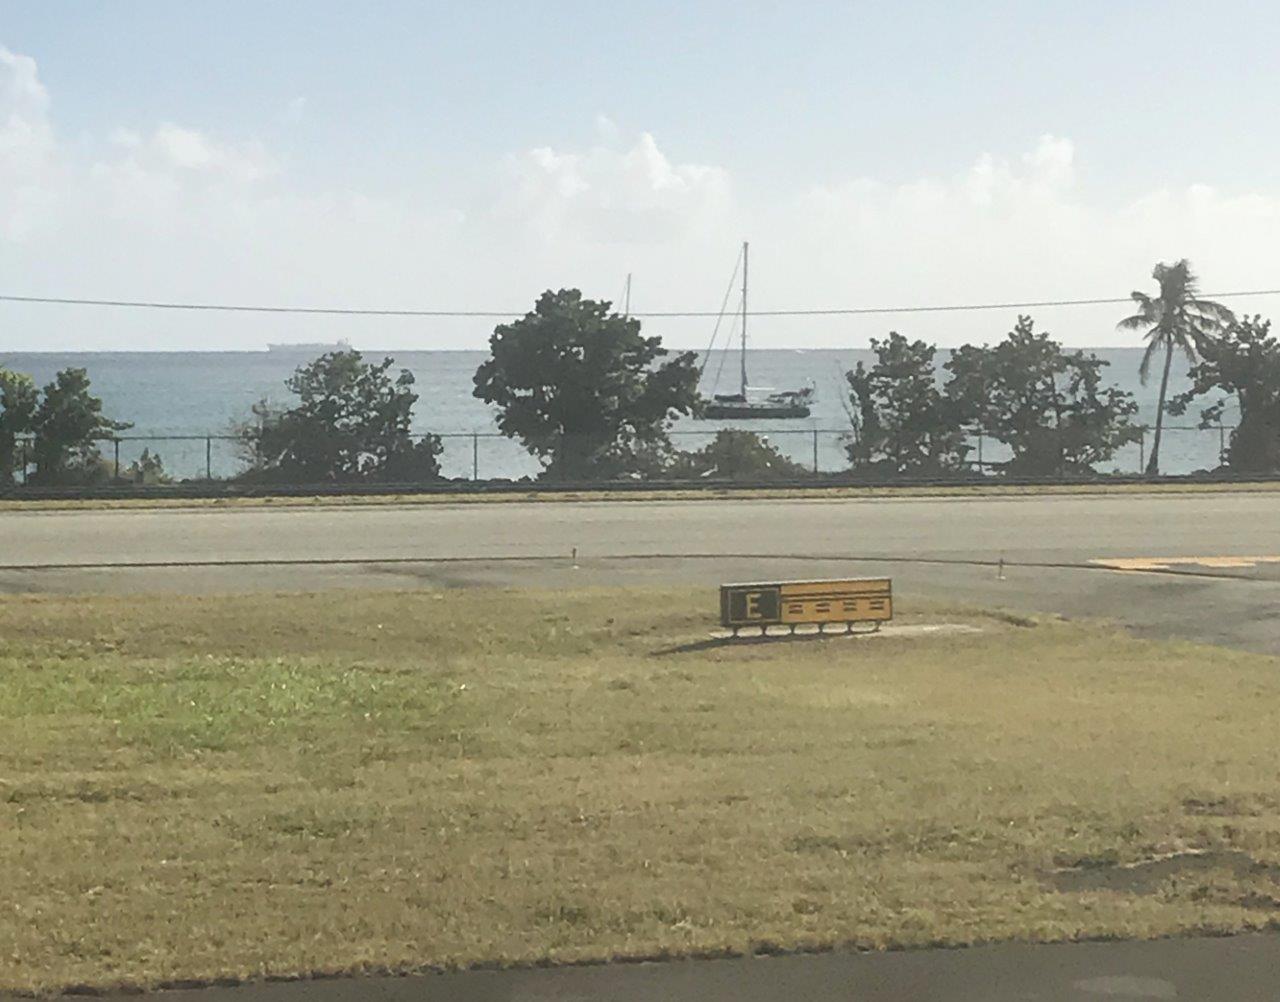 View of Pura Vida from airport runway (Photo Credit: Ashley Hoover)